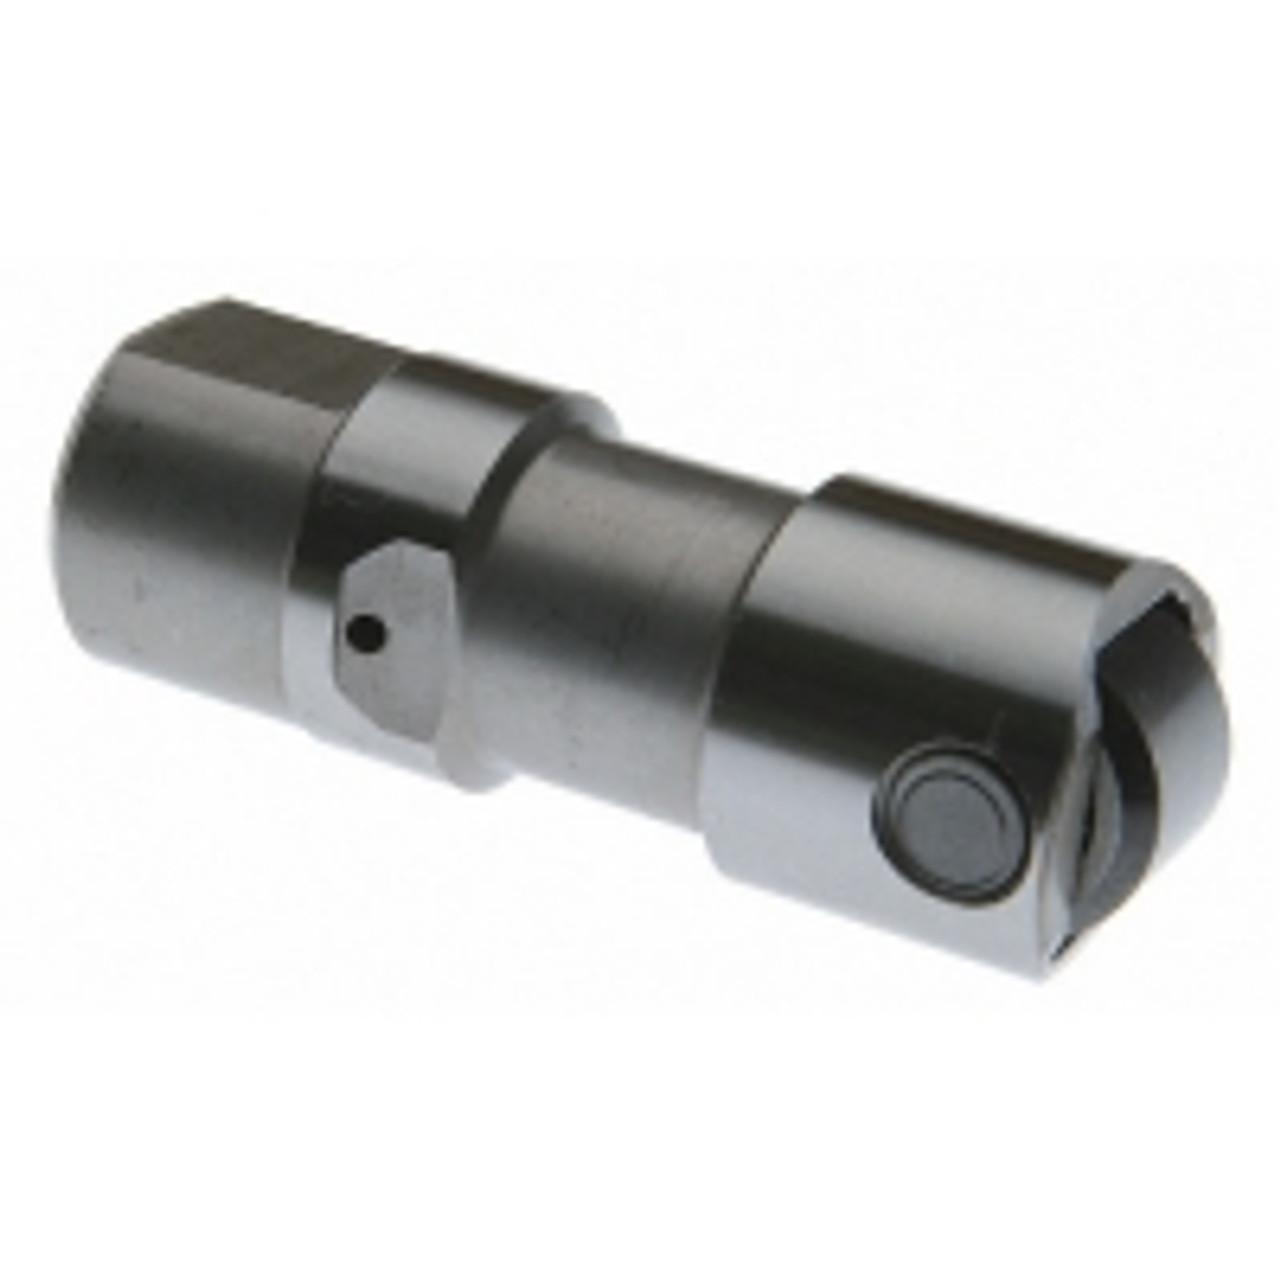 6.0/6.4 Powerstroke Cam Follow/Lifter